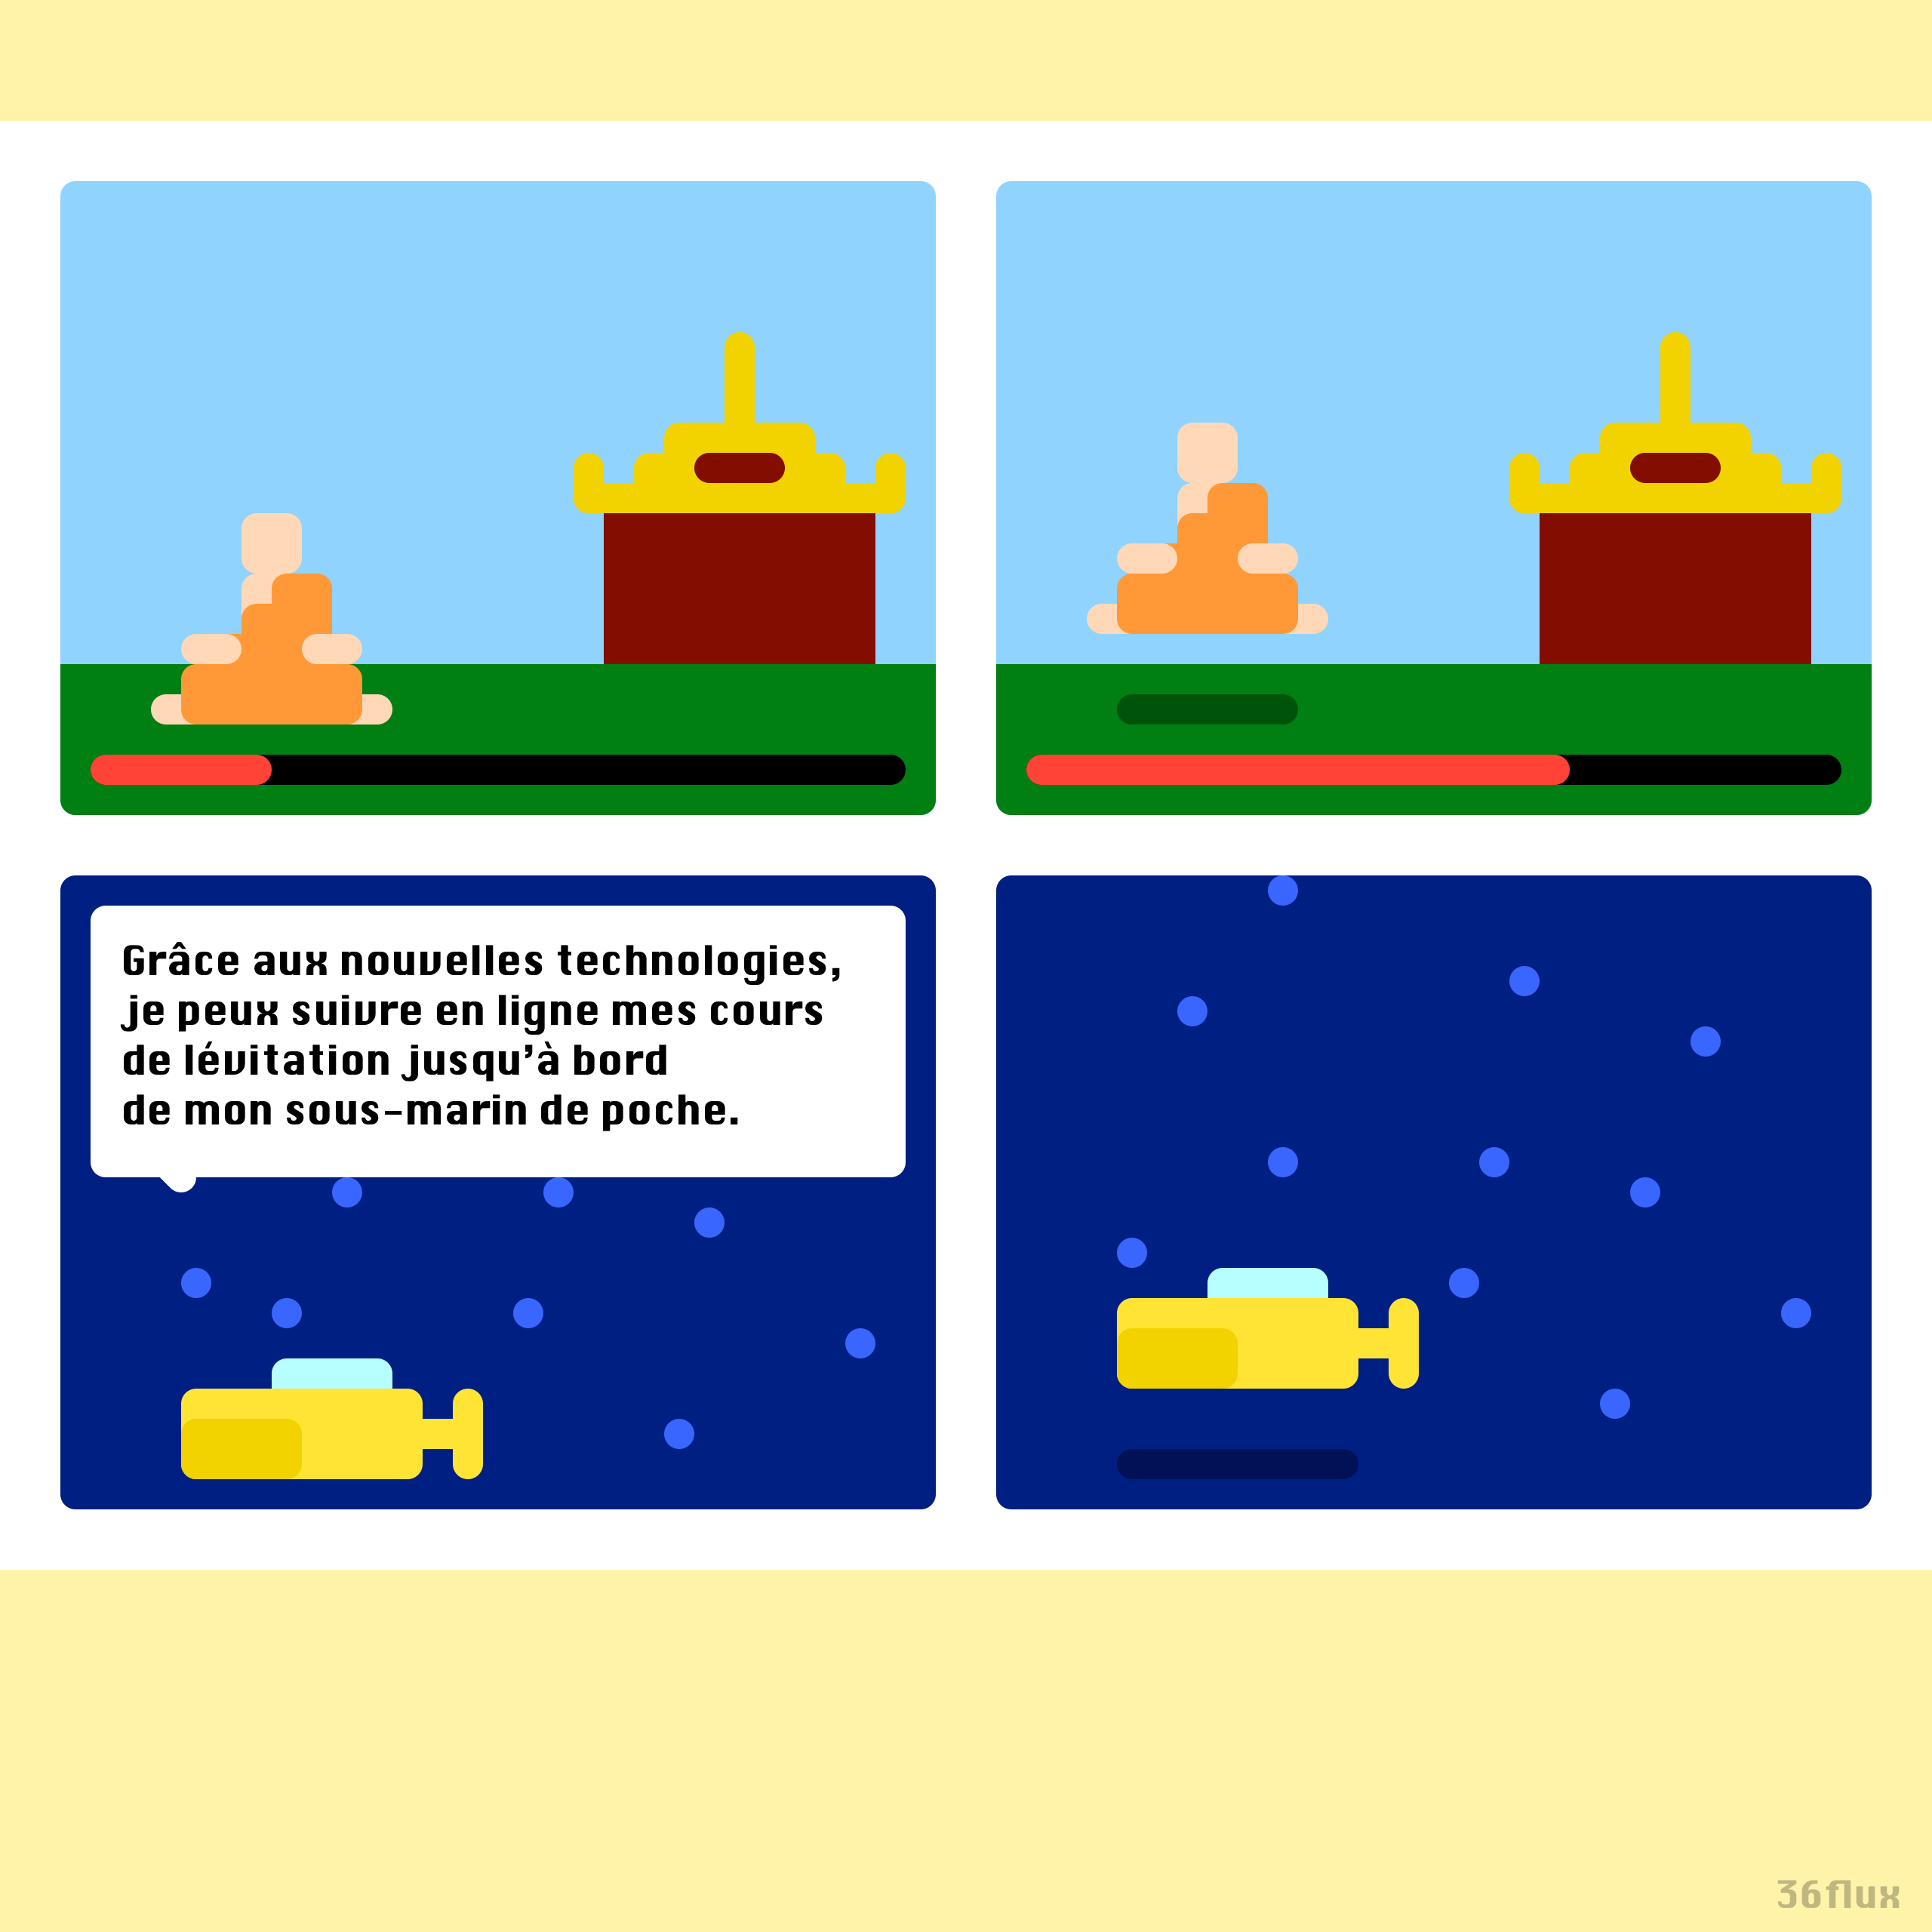 lwebcomics évitation, sous-marin